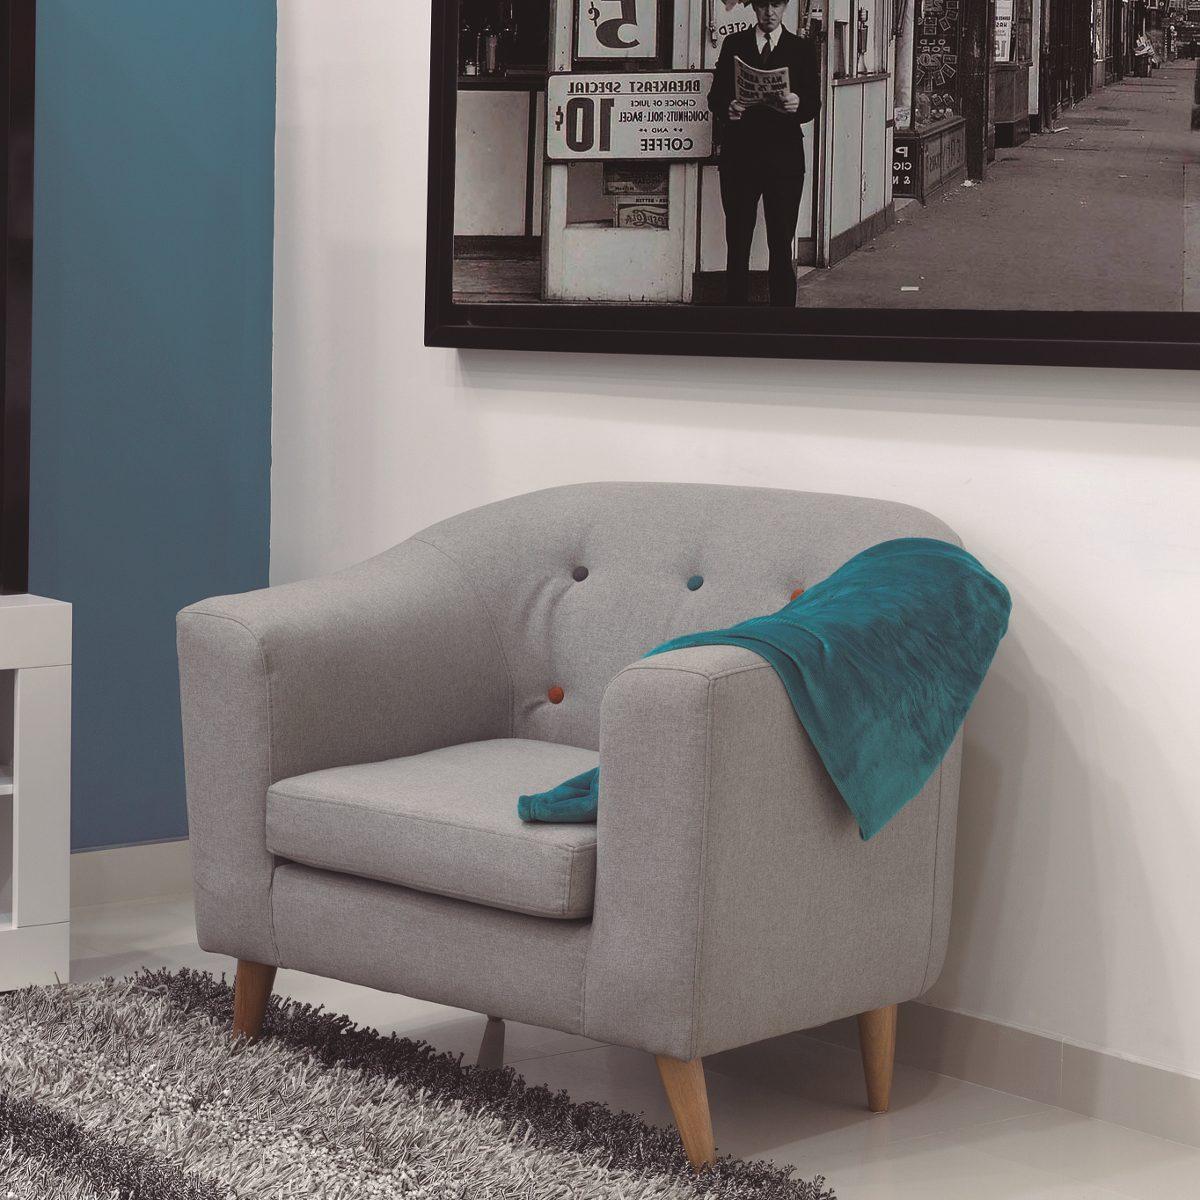 Poltrona moderna con patas en madera y botones ori n for Precio de salas modernas